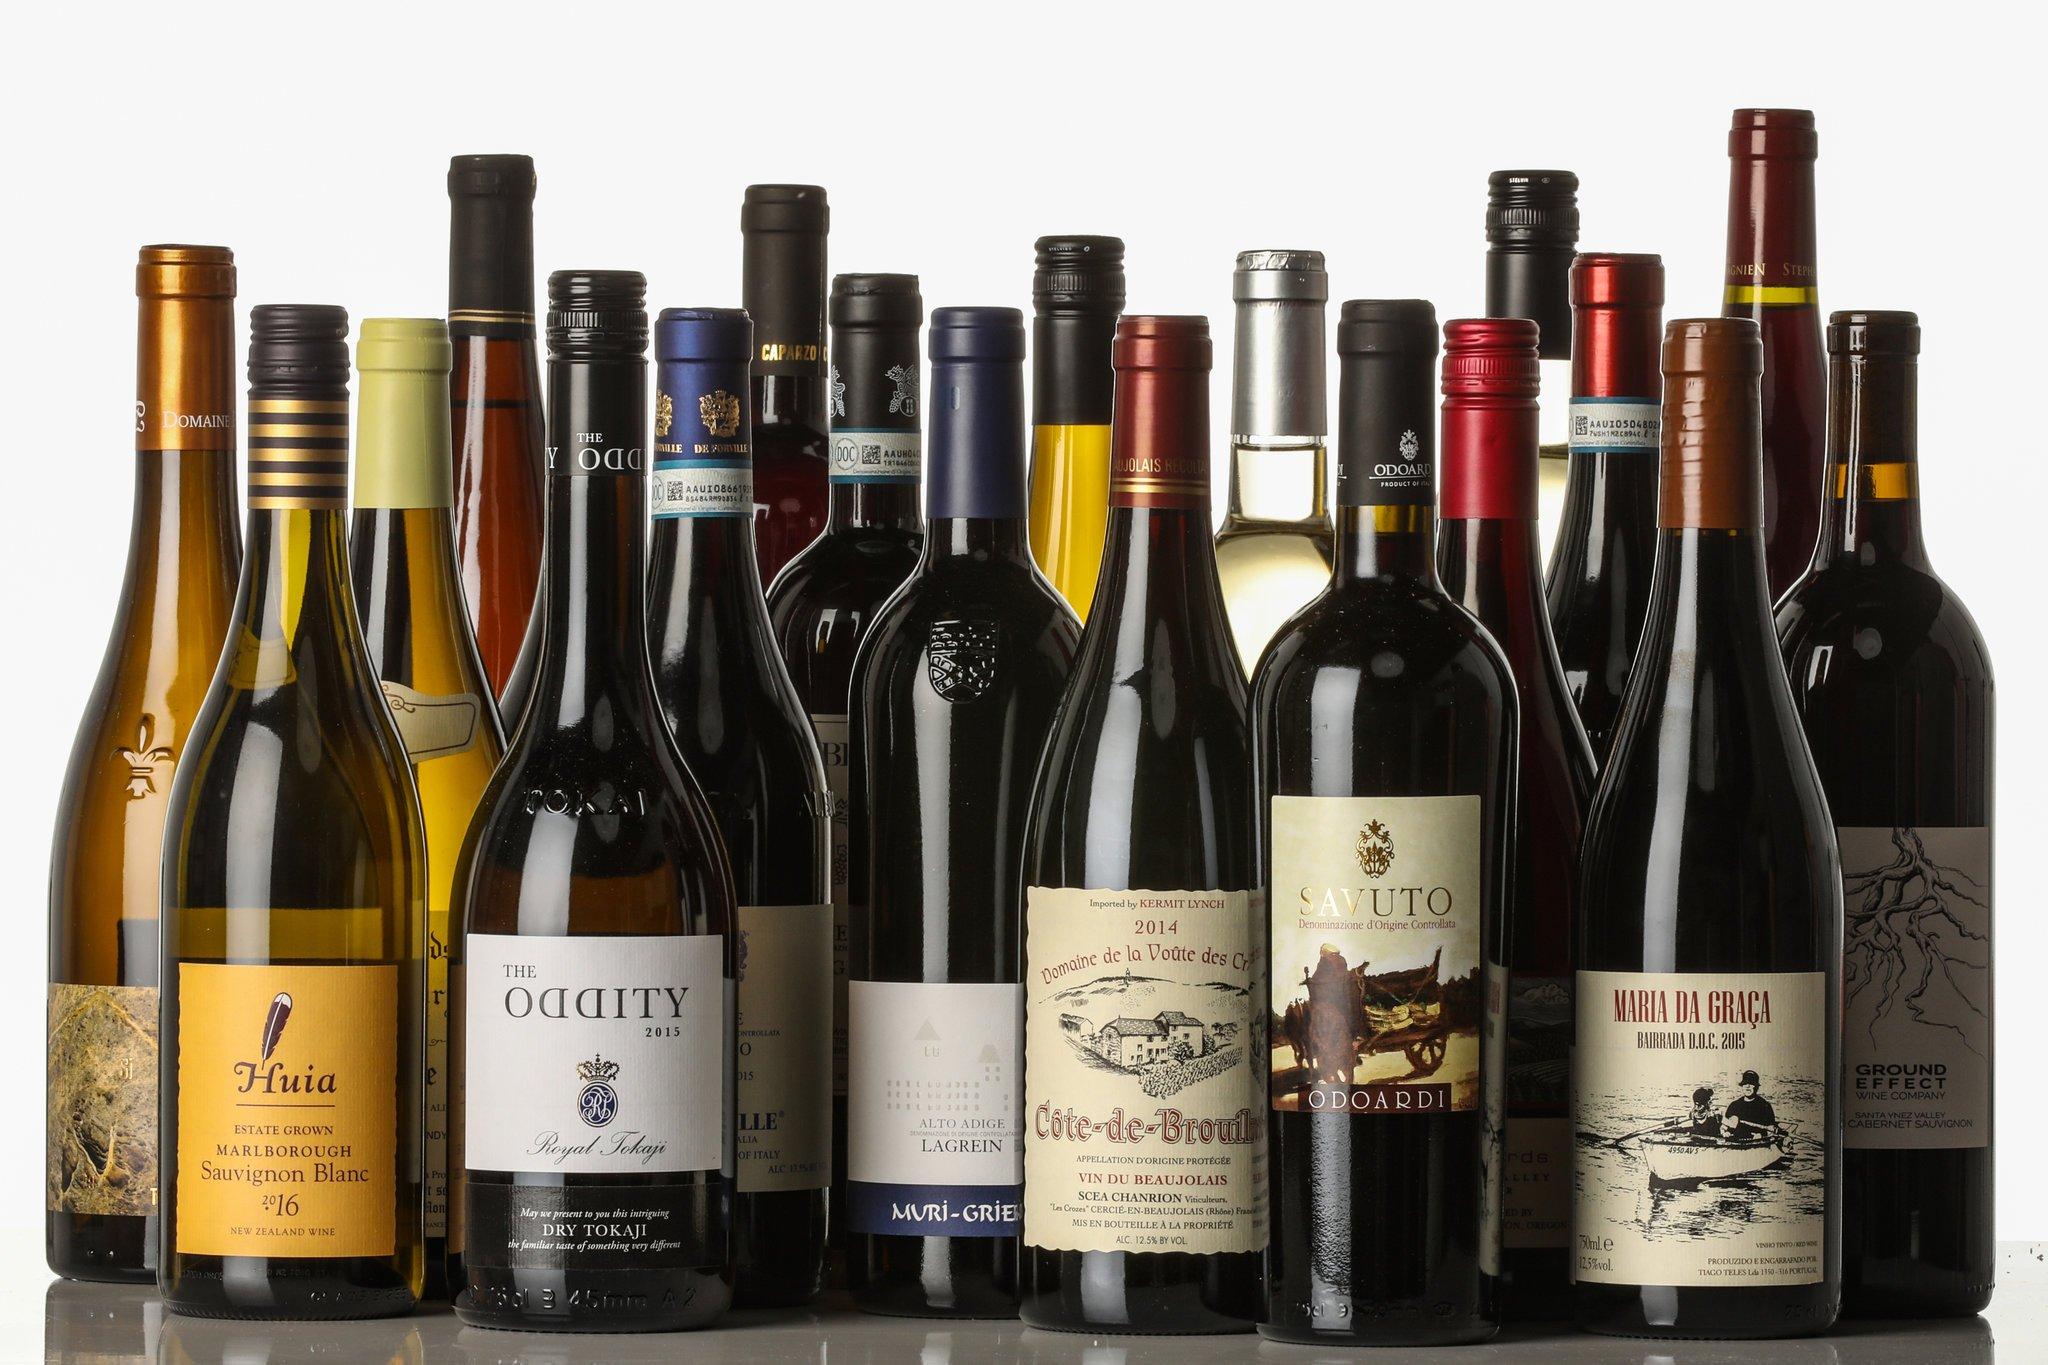 Red wine de Broff 12% spanish red wine for sale